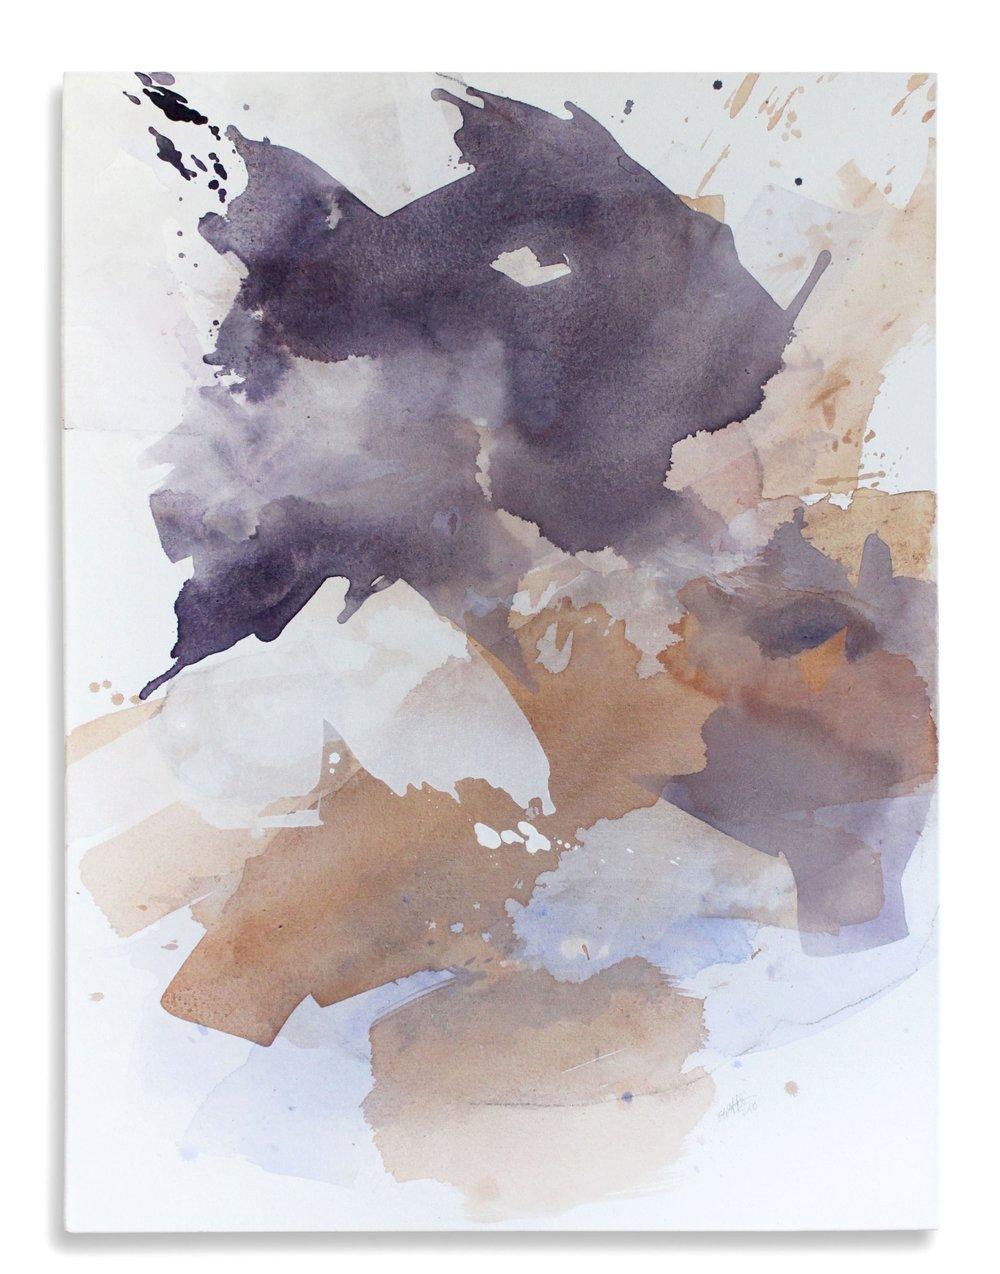 LIGHT ON THE WATER / acrylic on canvas / 30 x 40 / 2018 / Available through  Jenner McGinn Studio